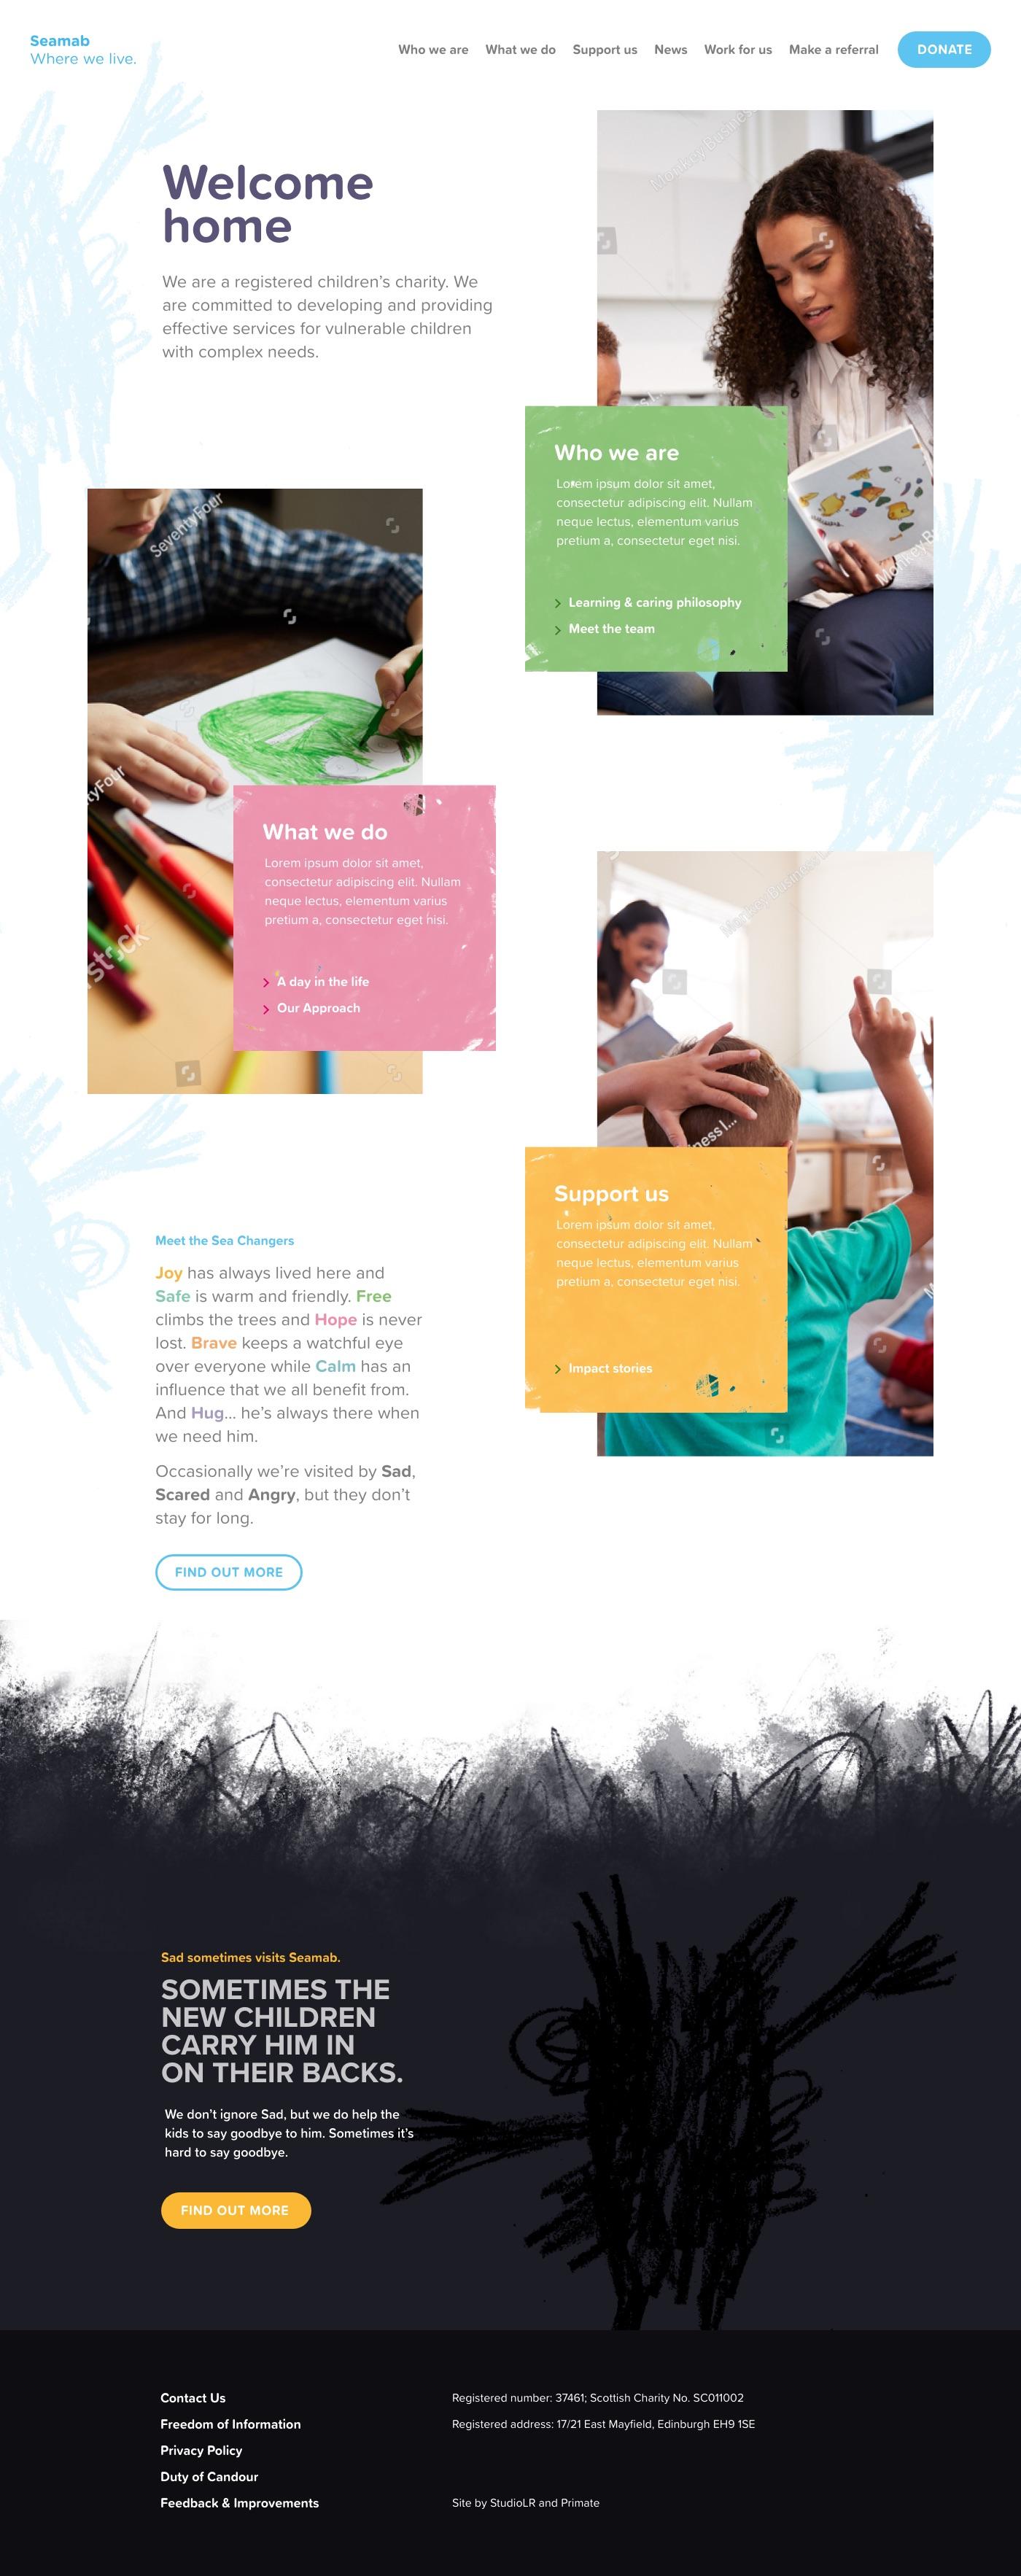 New Seamab homepage